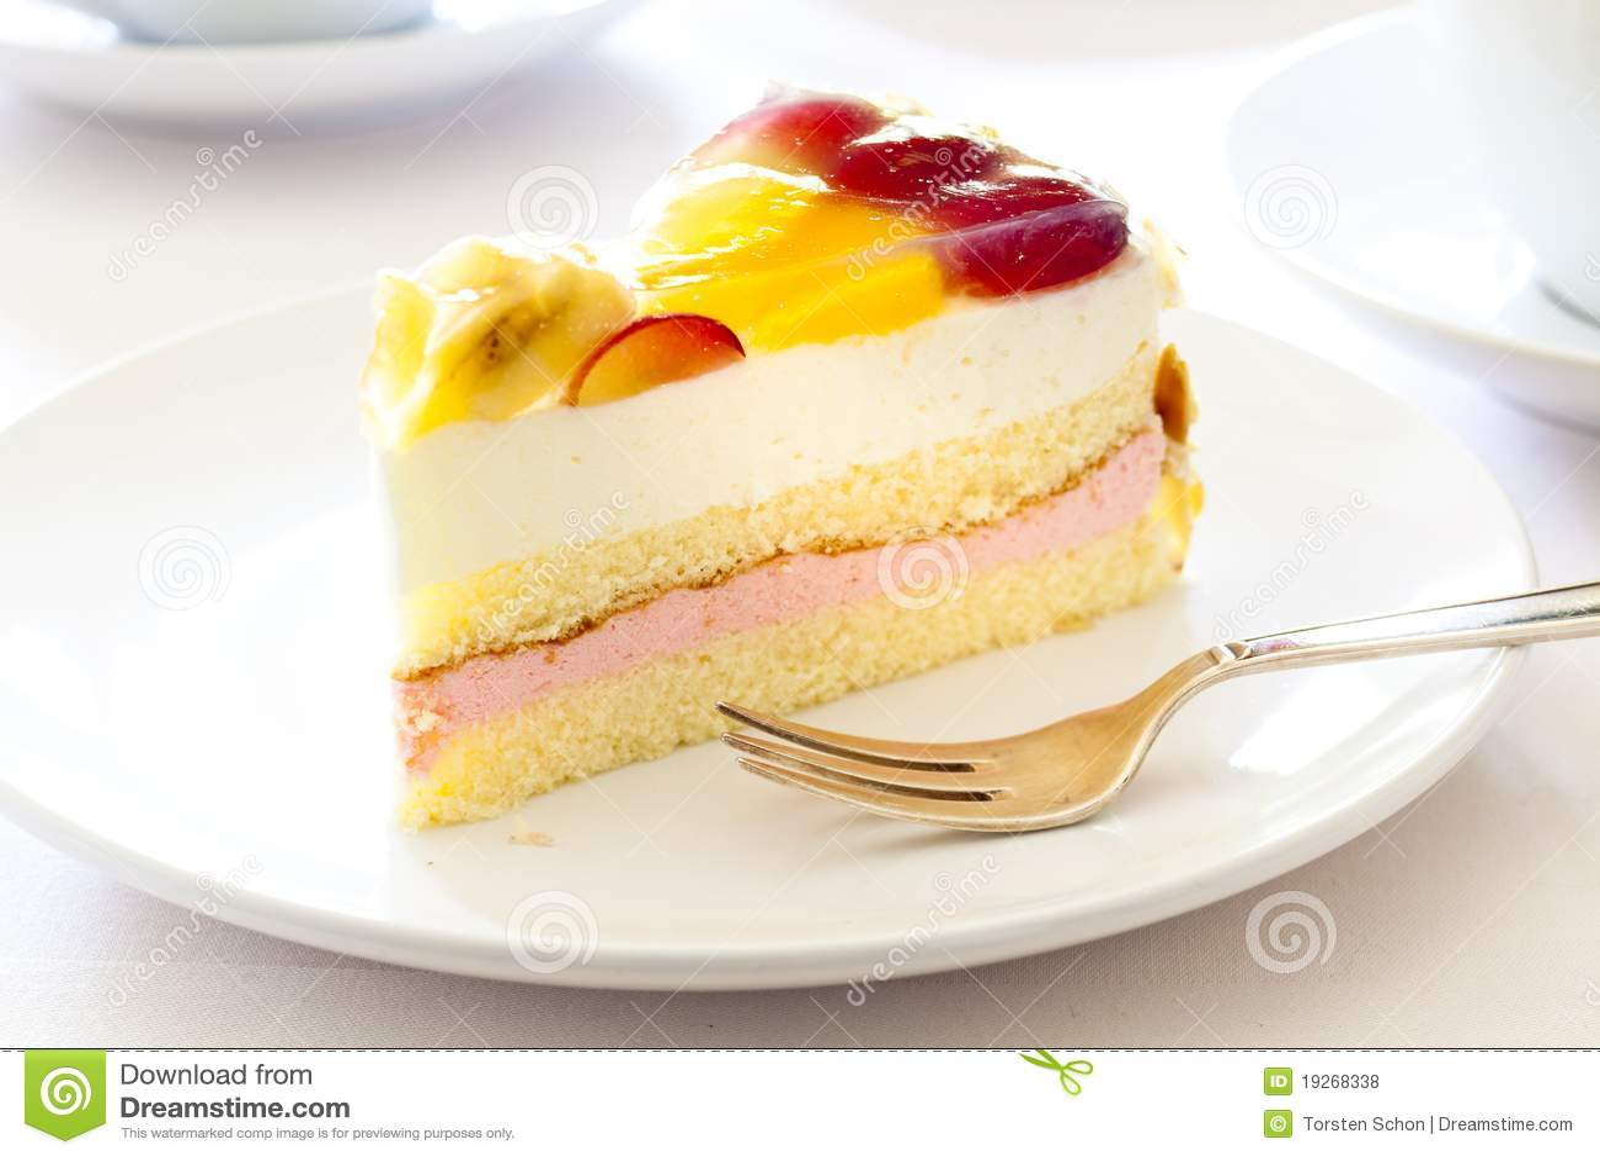 _poner crema torta con fruta